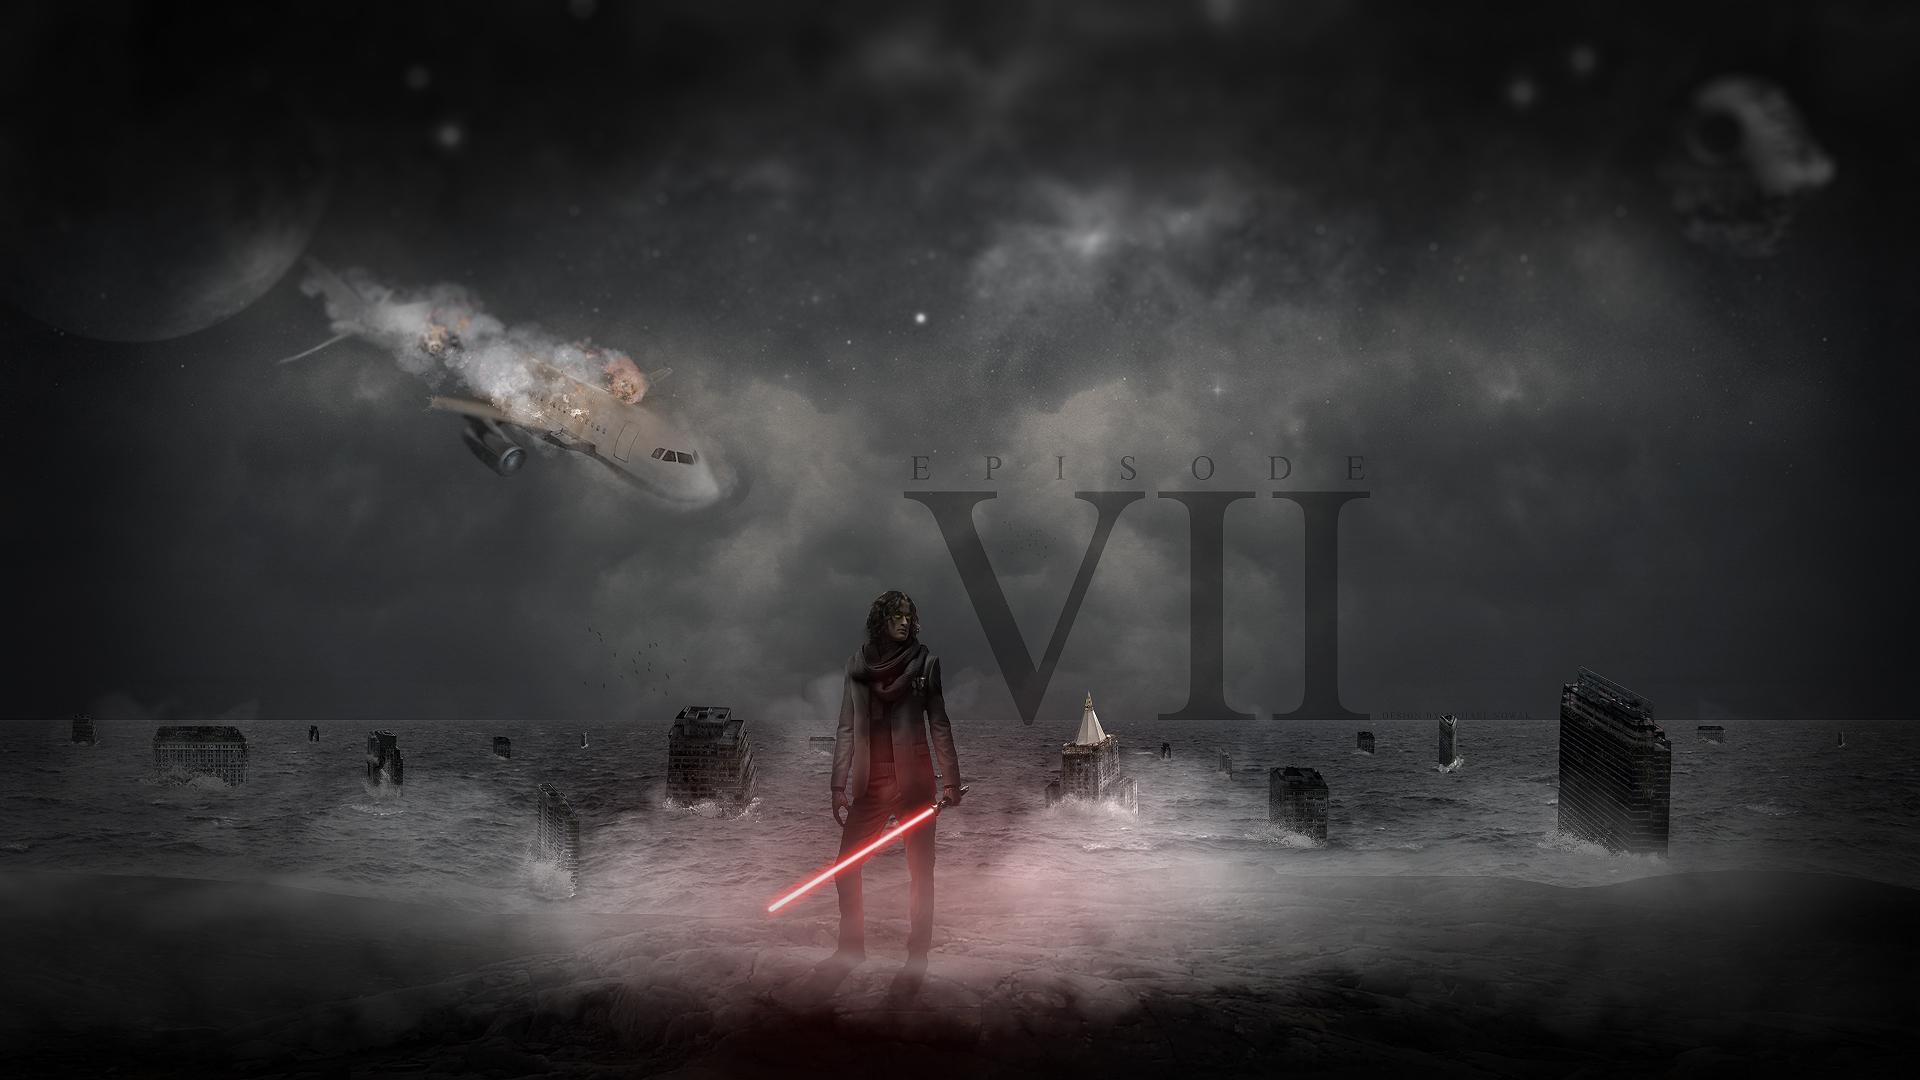 Star Wars Episode 7 Wallpapers - WallpaperSafari